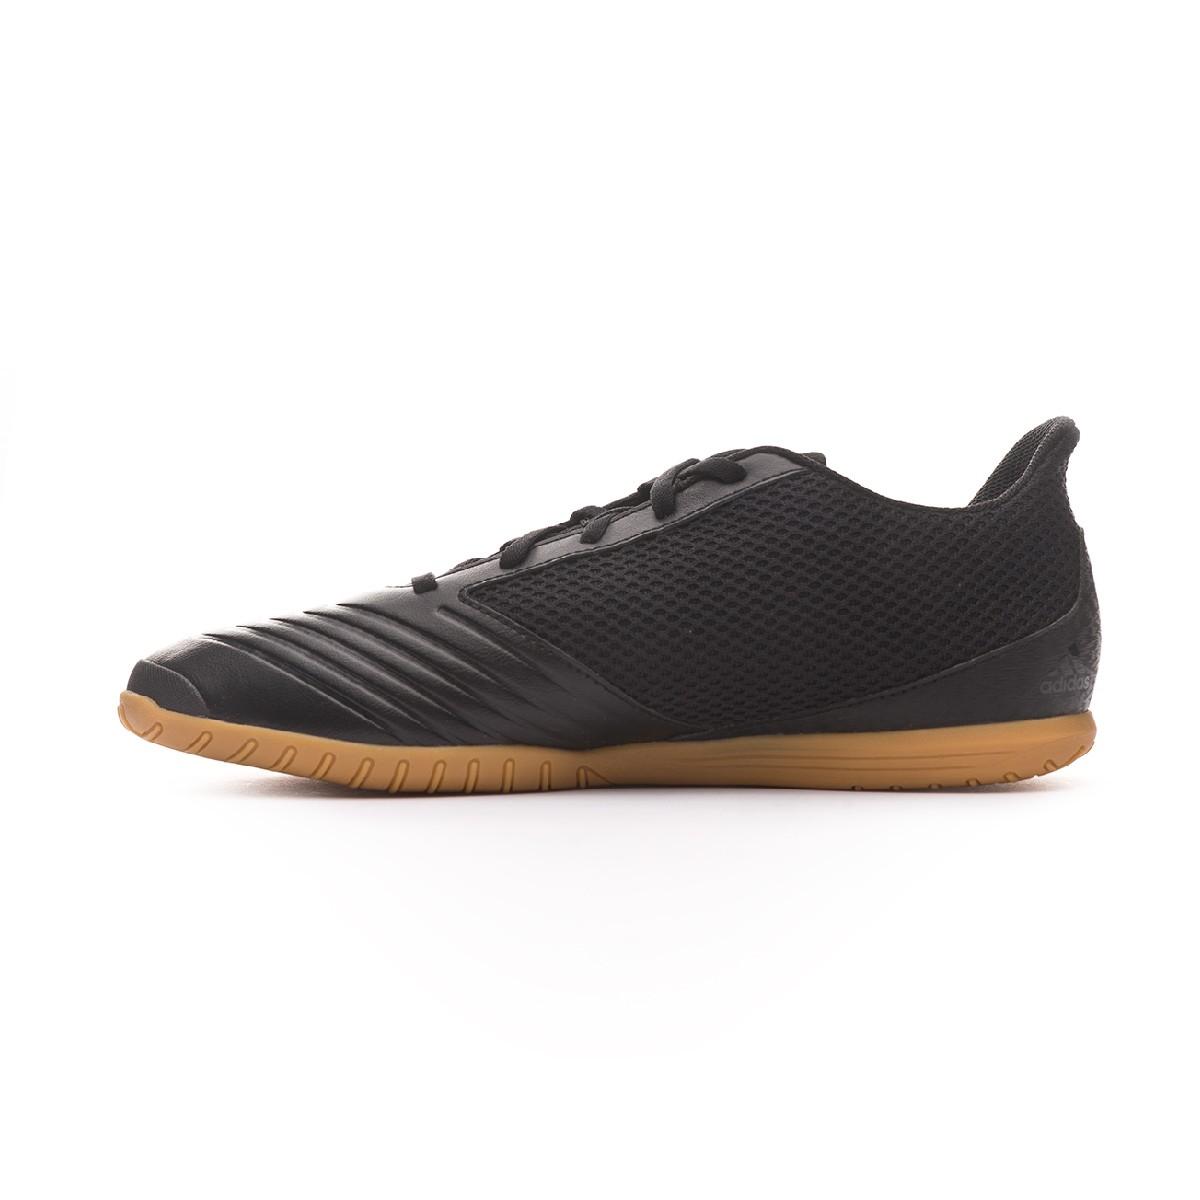 Chuteiras Futebol Adidas Predator Tango 19.4 Preto